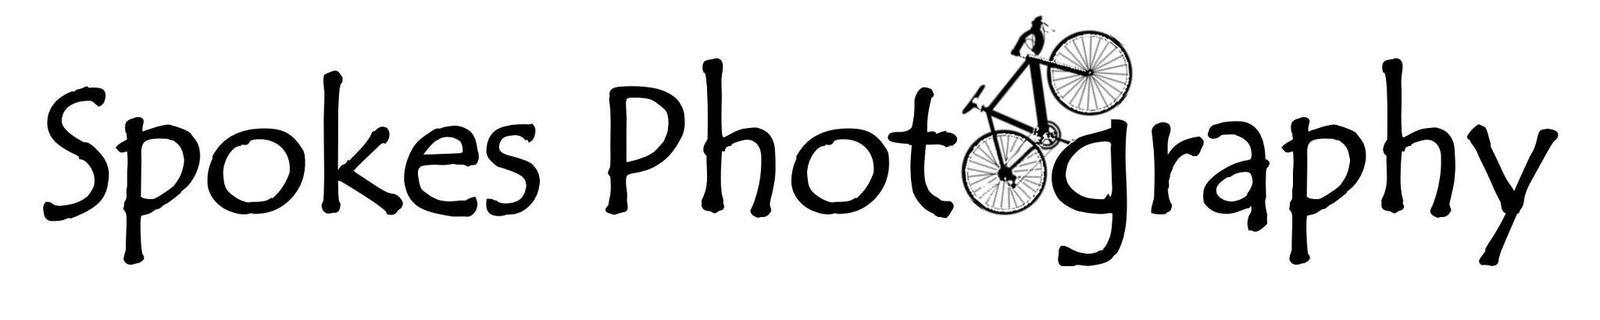 Spokes Photography